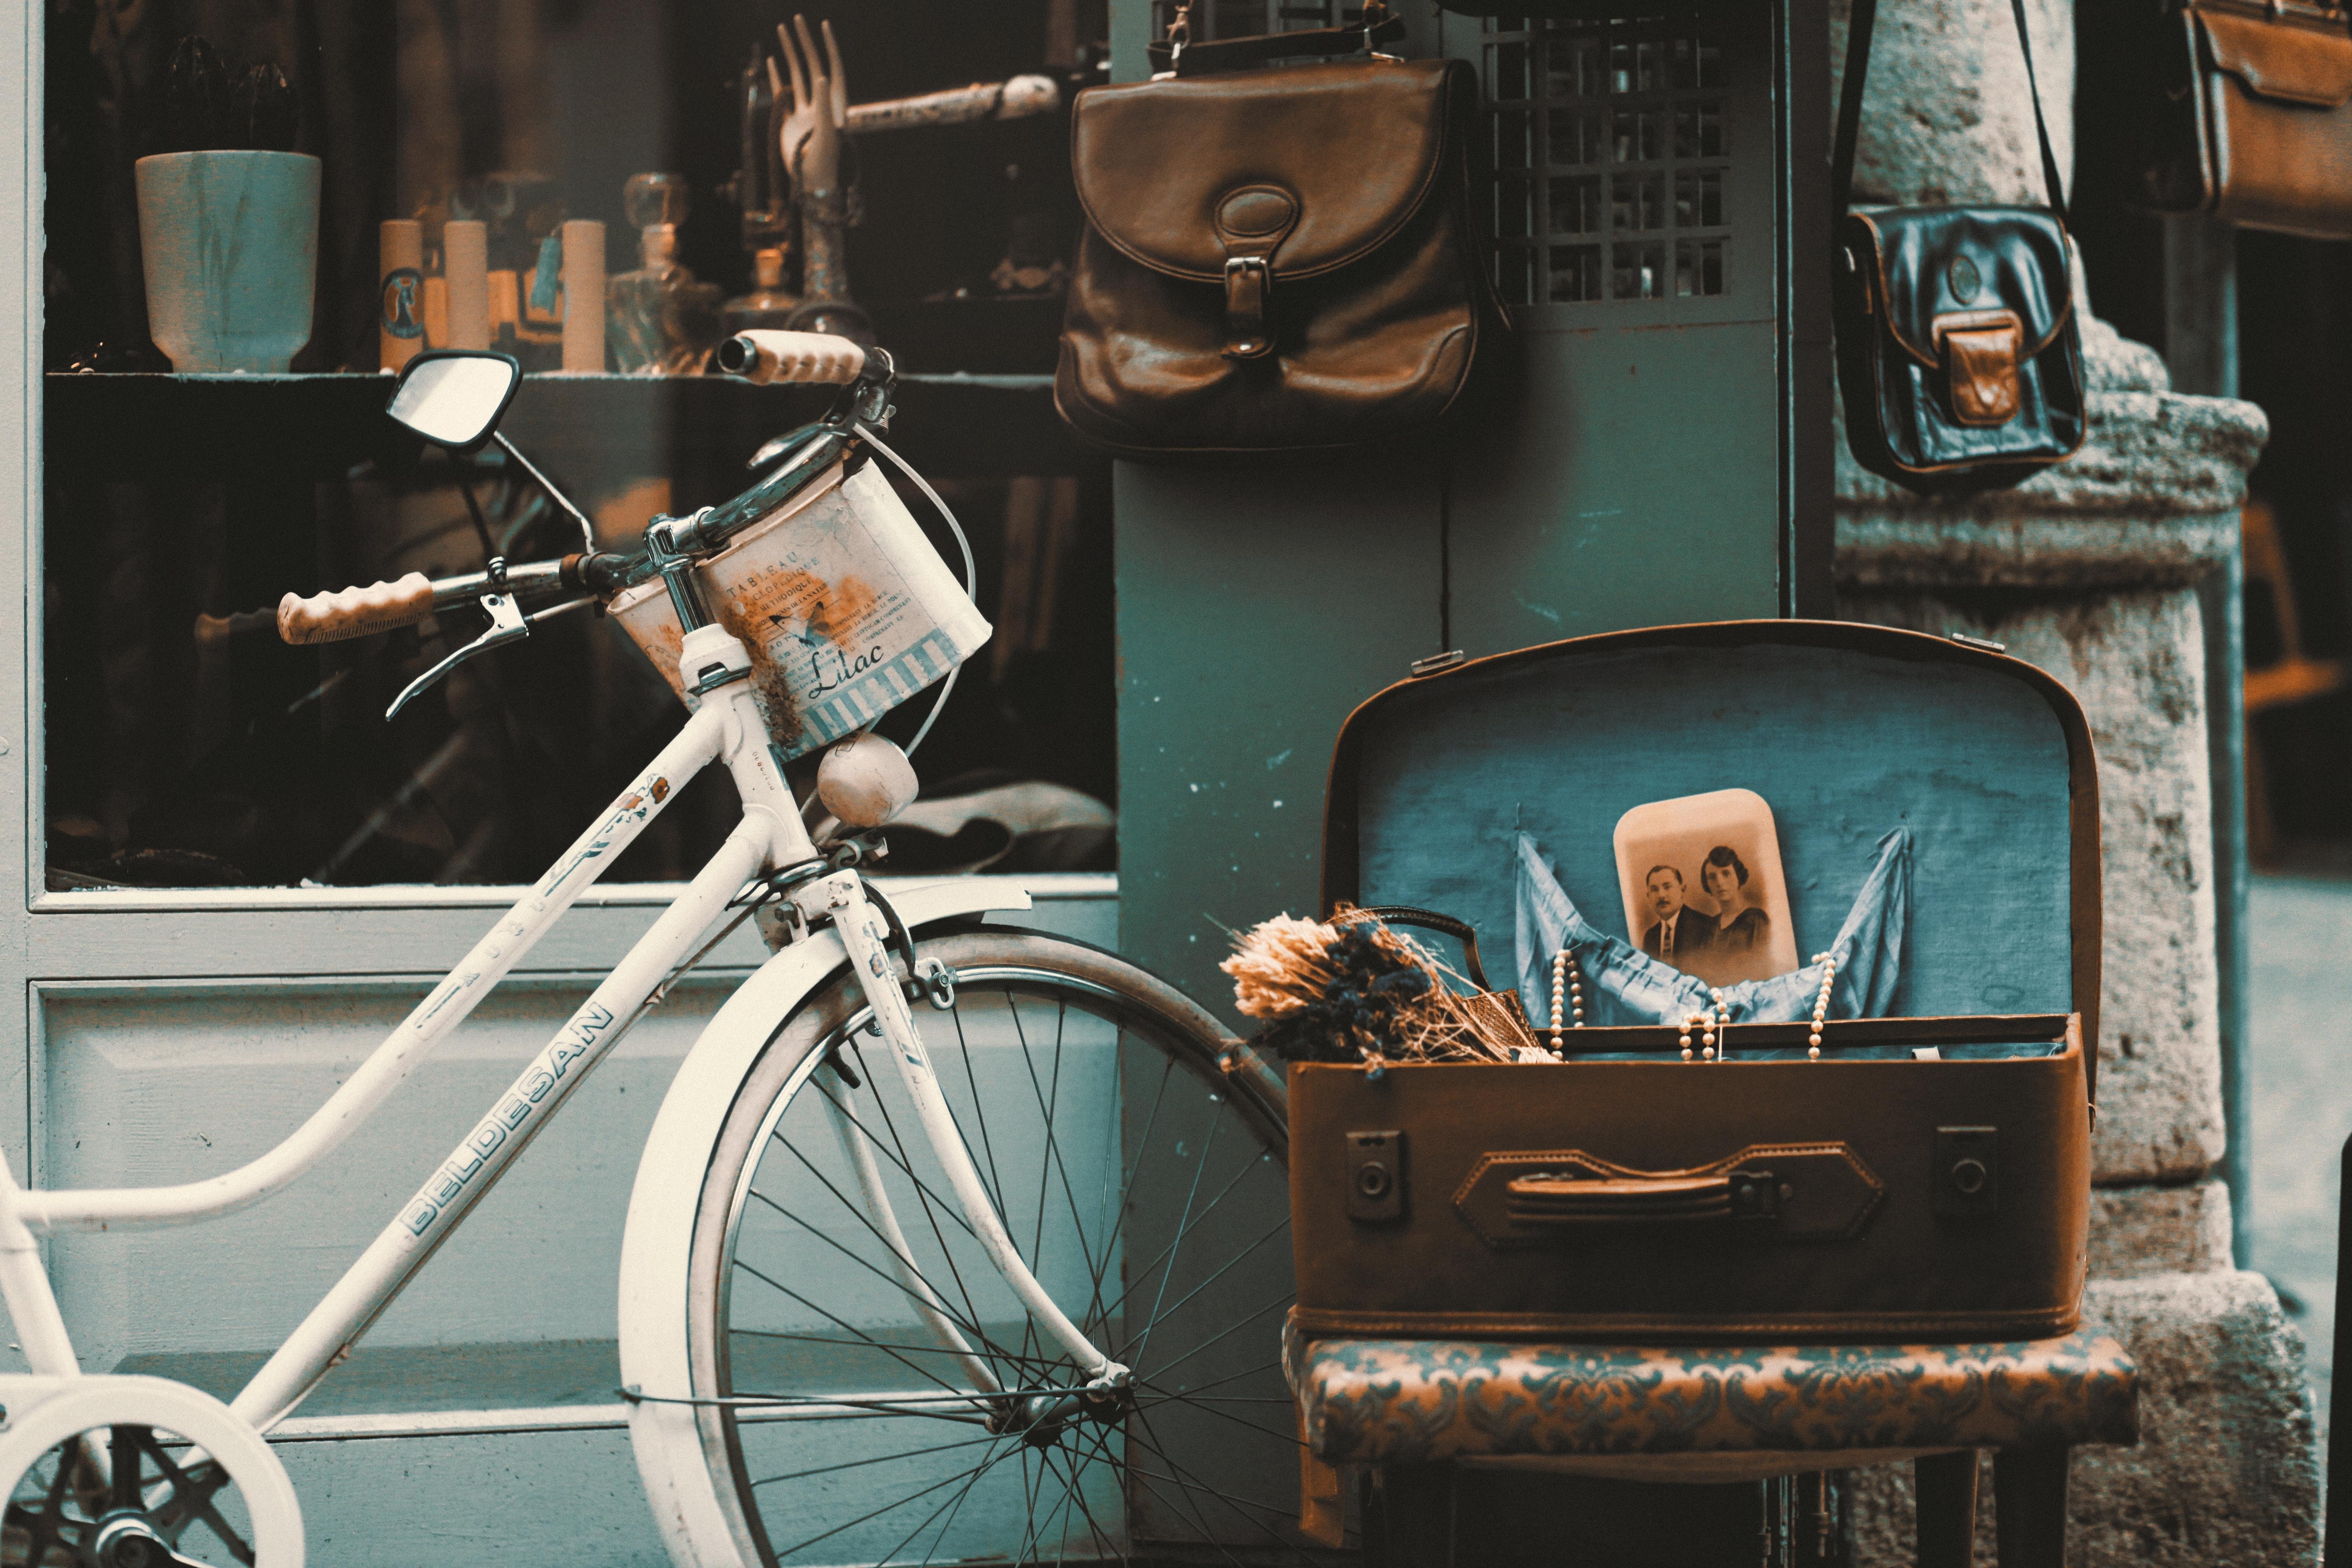 Thrift shop with bike